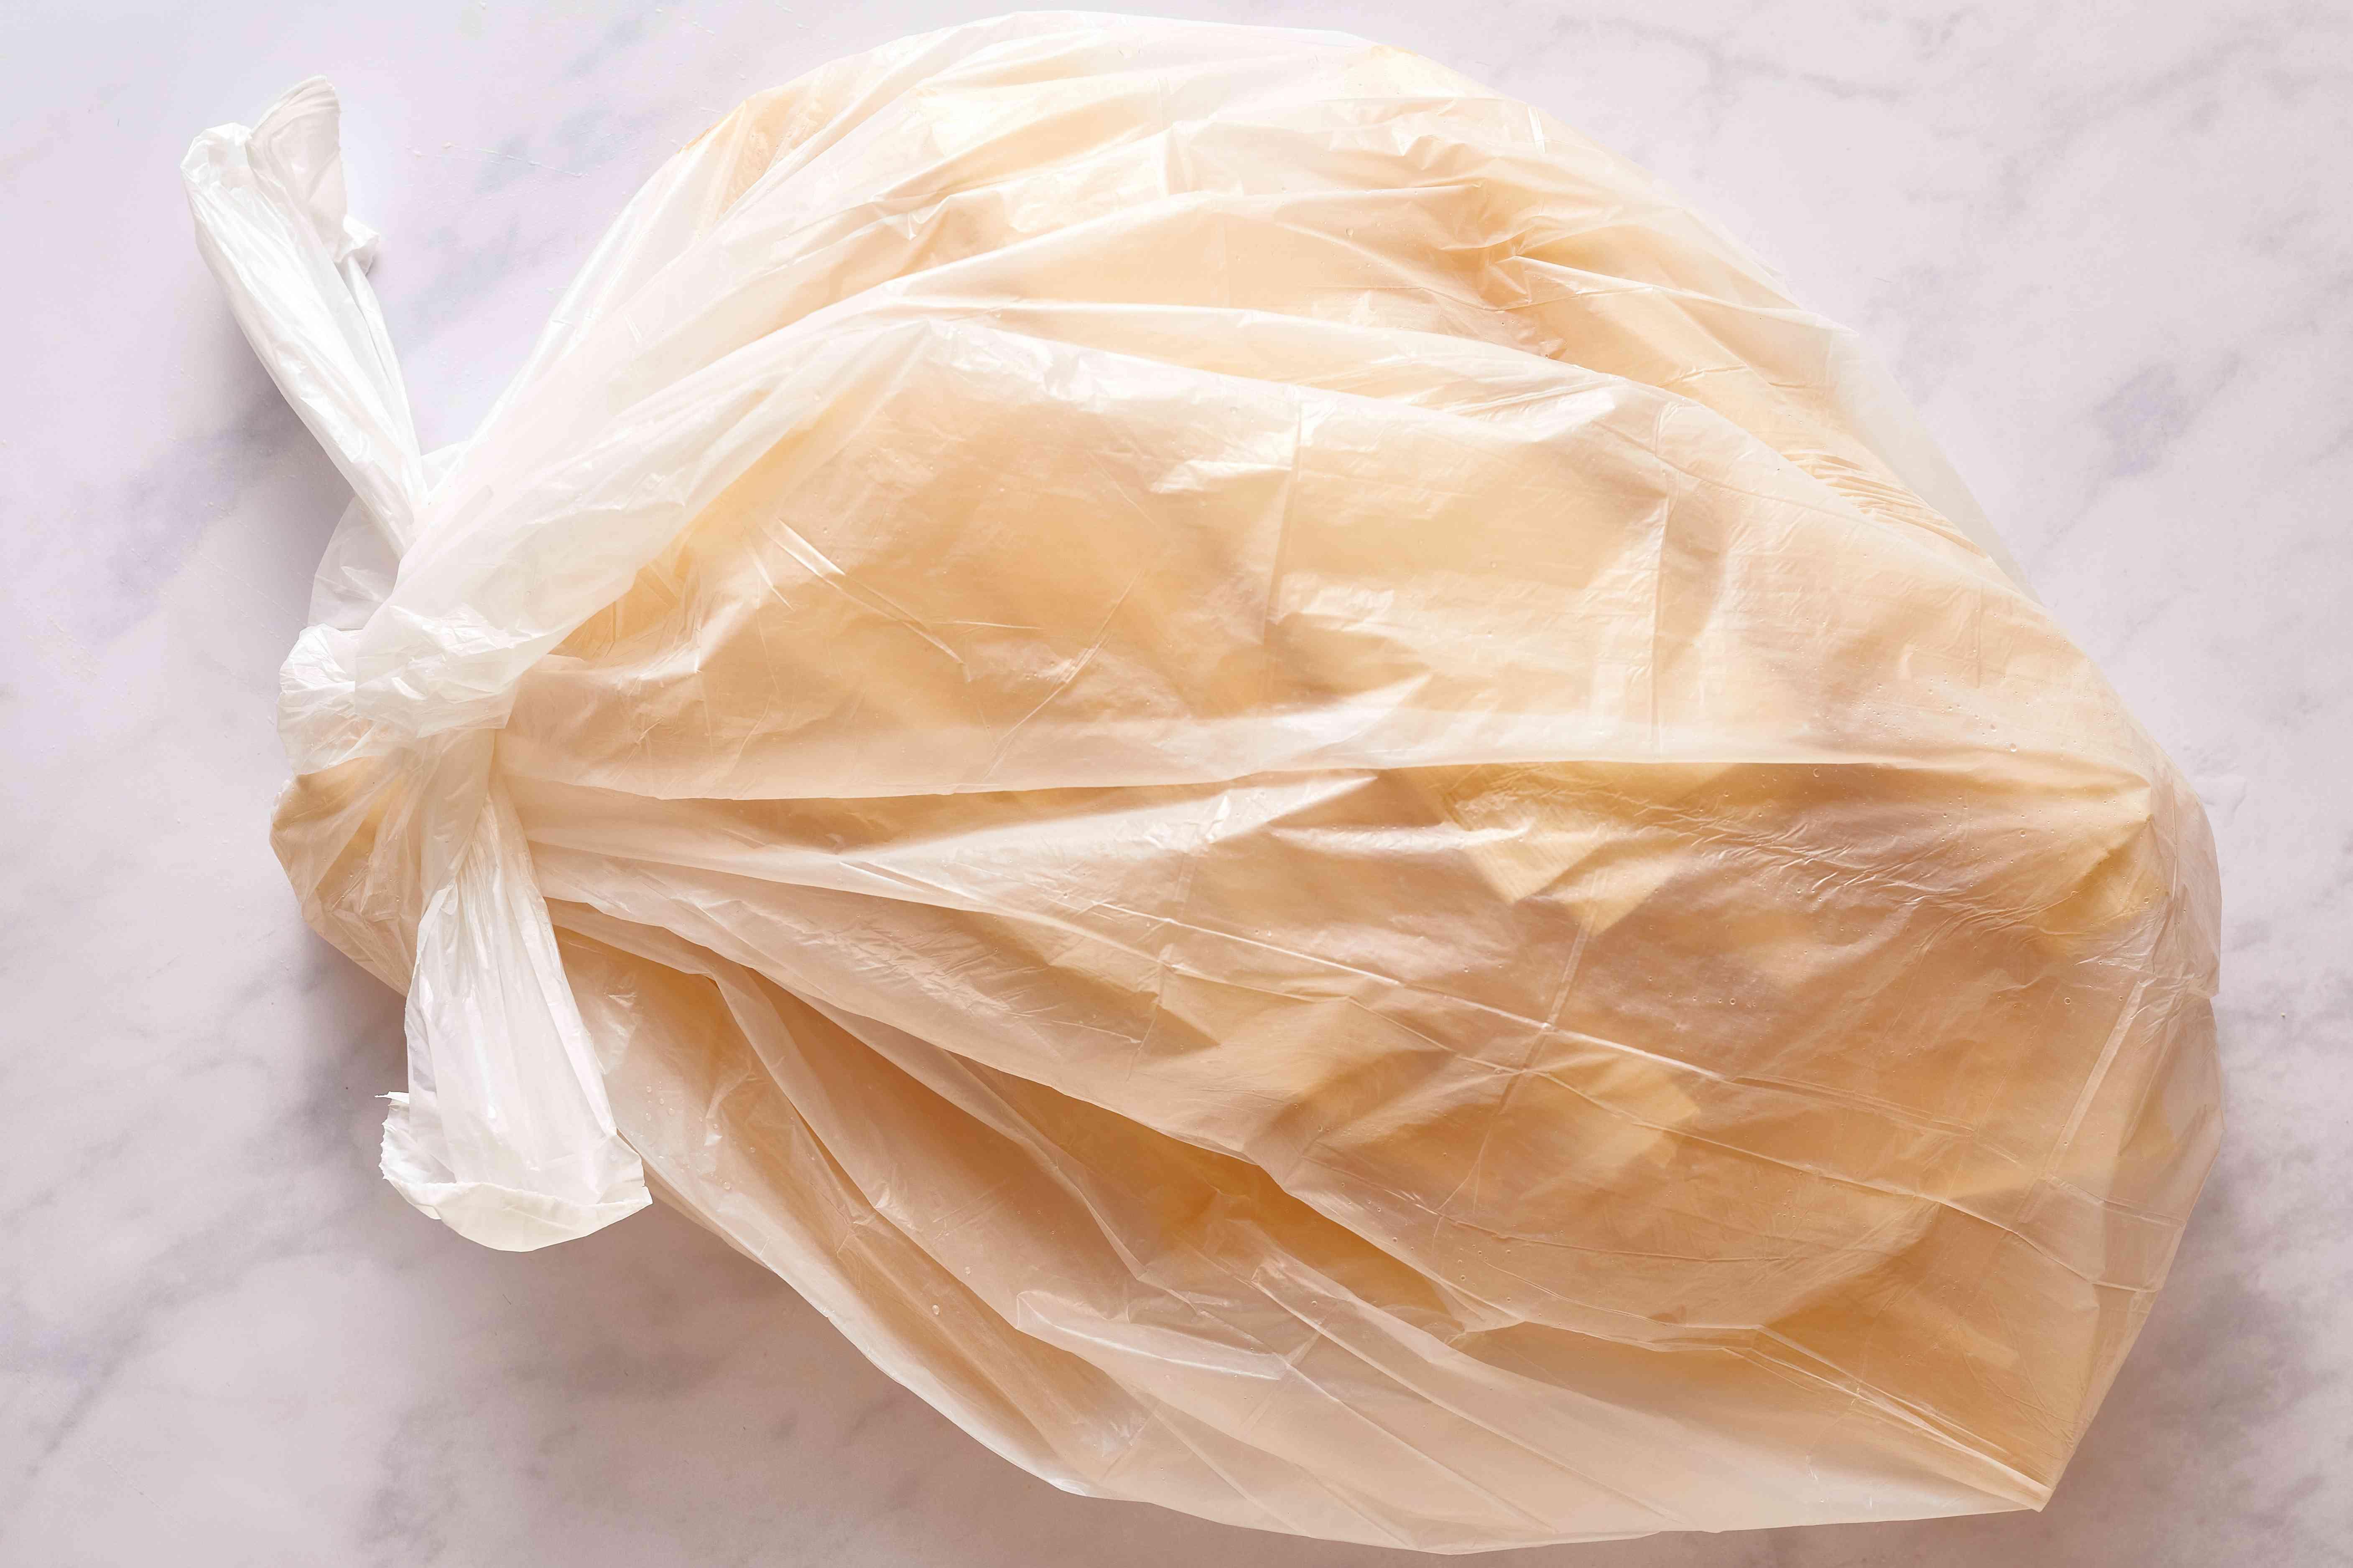 corn husks in a bag